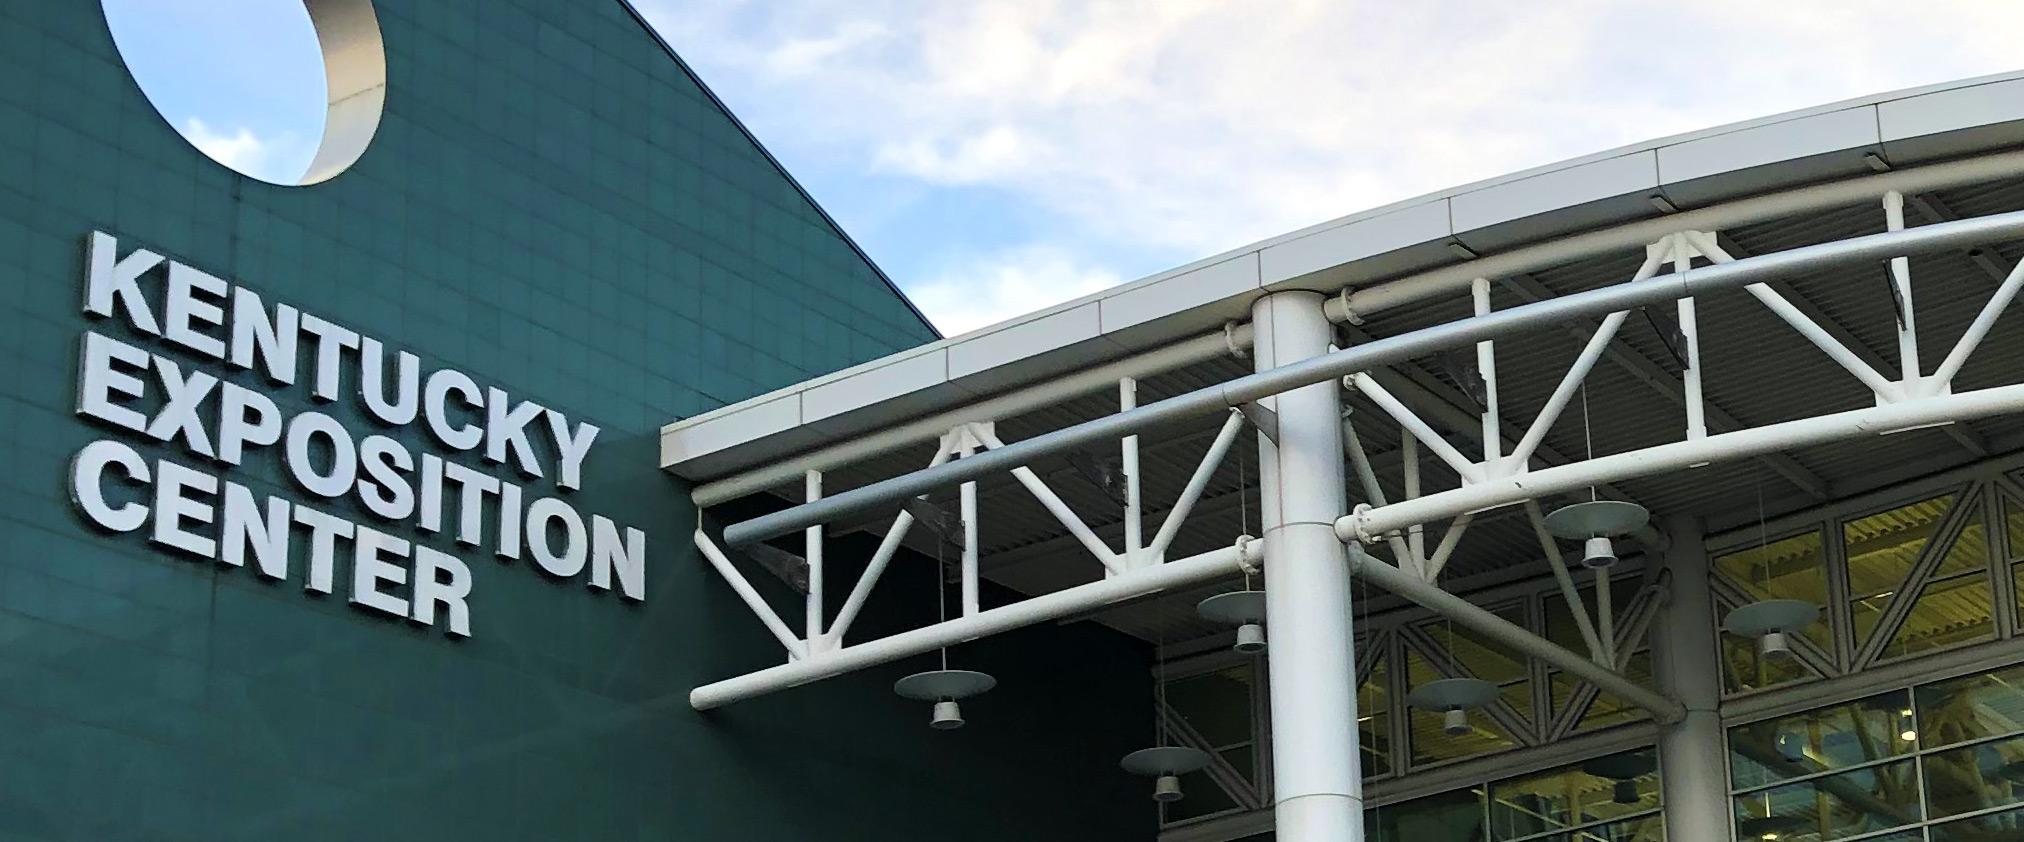 Kentucky Exposition Center Louisville